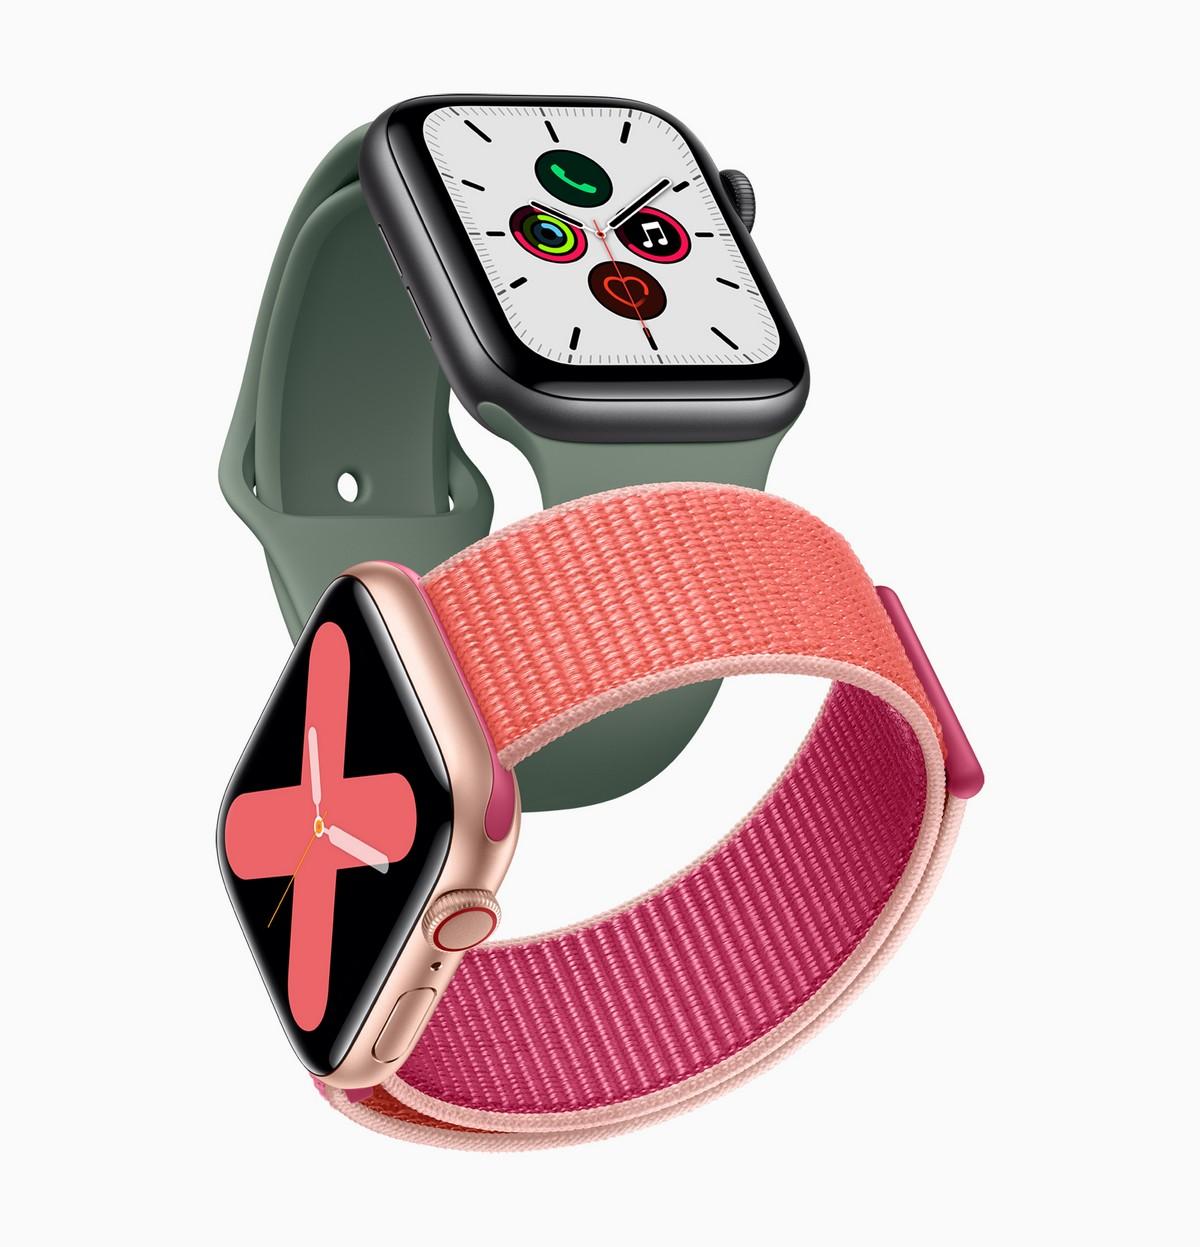 Ce afectiune a detectat Apple Watch si care n-a fost detectata de un echipament medical specializat